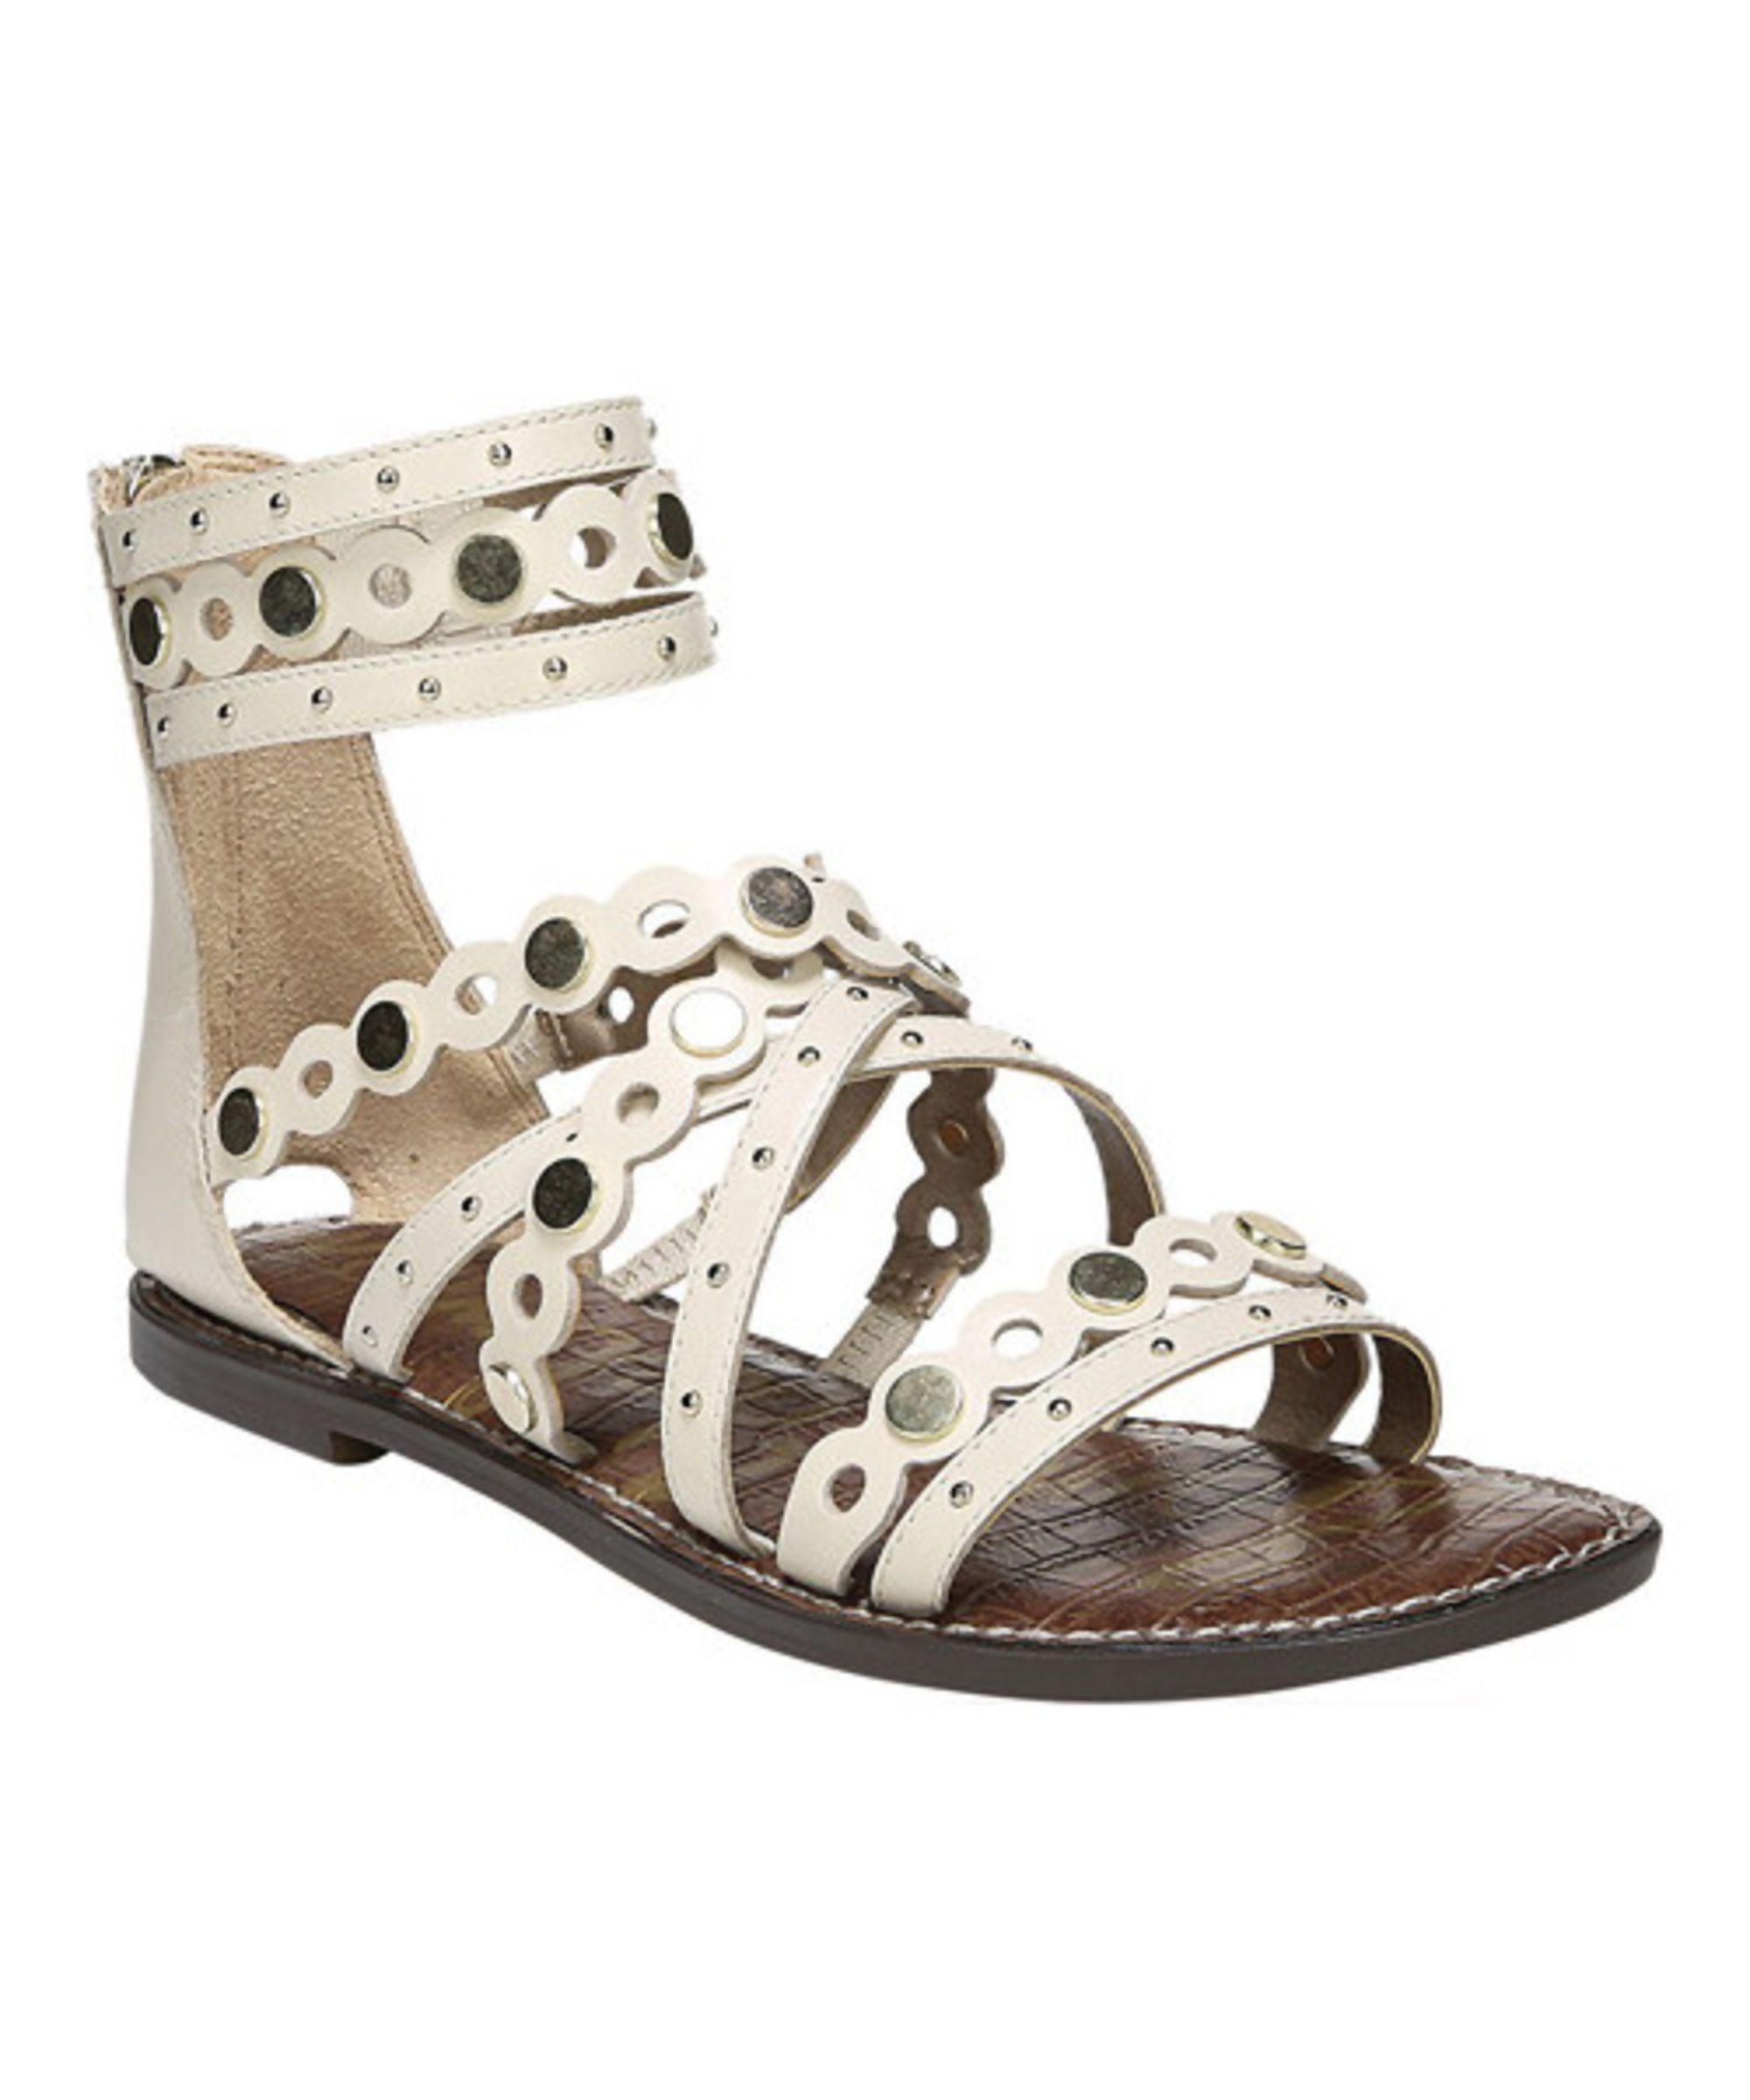 SAM EDELMAN   Sam Edelman Women's Geren Ankle Cuff Gladiator Sandal #Shoes  #Sandals #